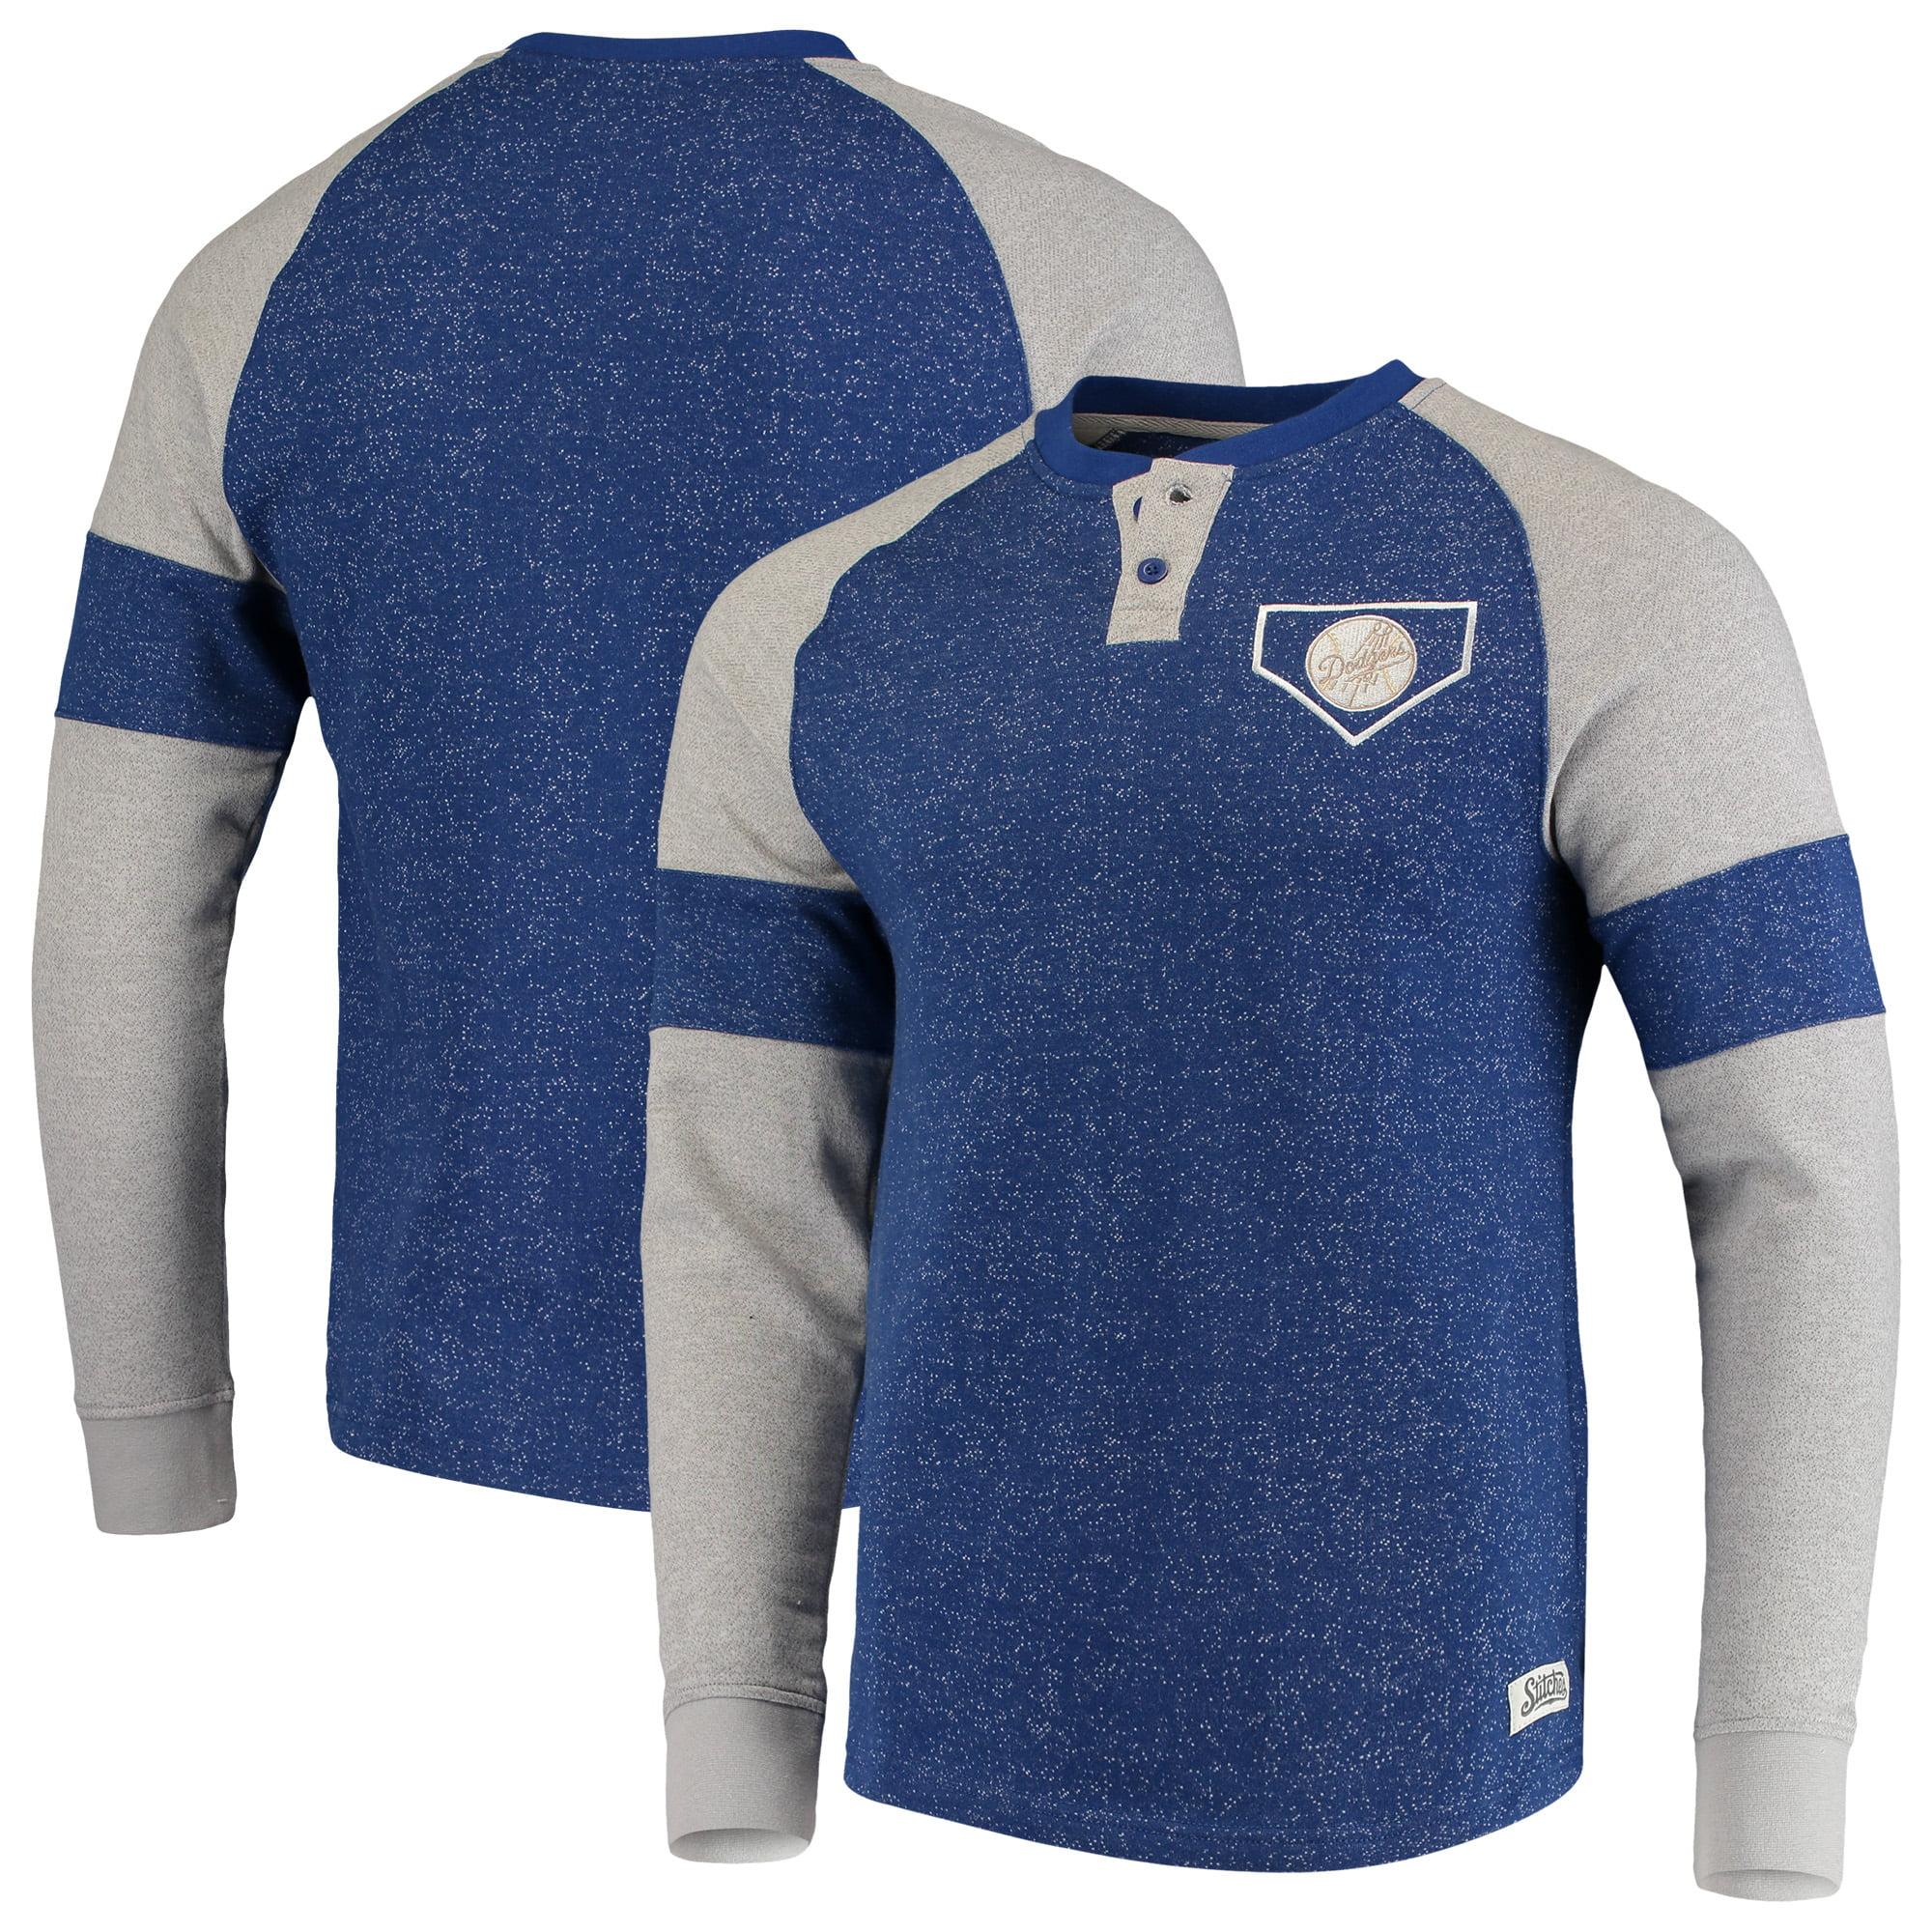 Los Angeles Dodgers Stitches Twisted Yarn Henley Long Sleeve Raglan T-Shirt - Heathered Royal